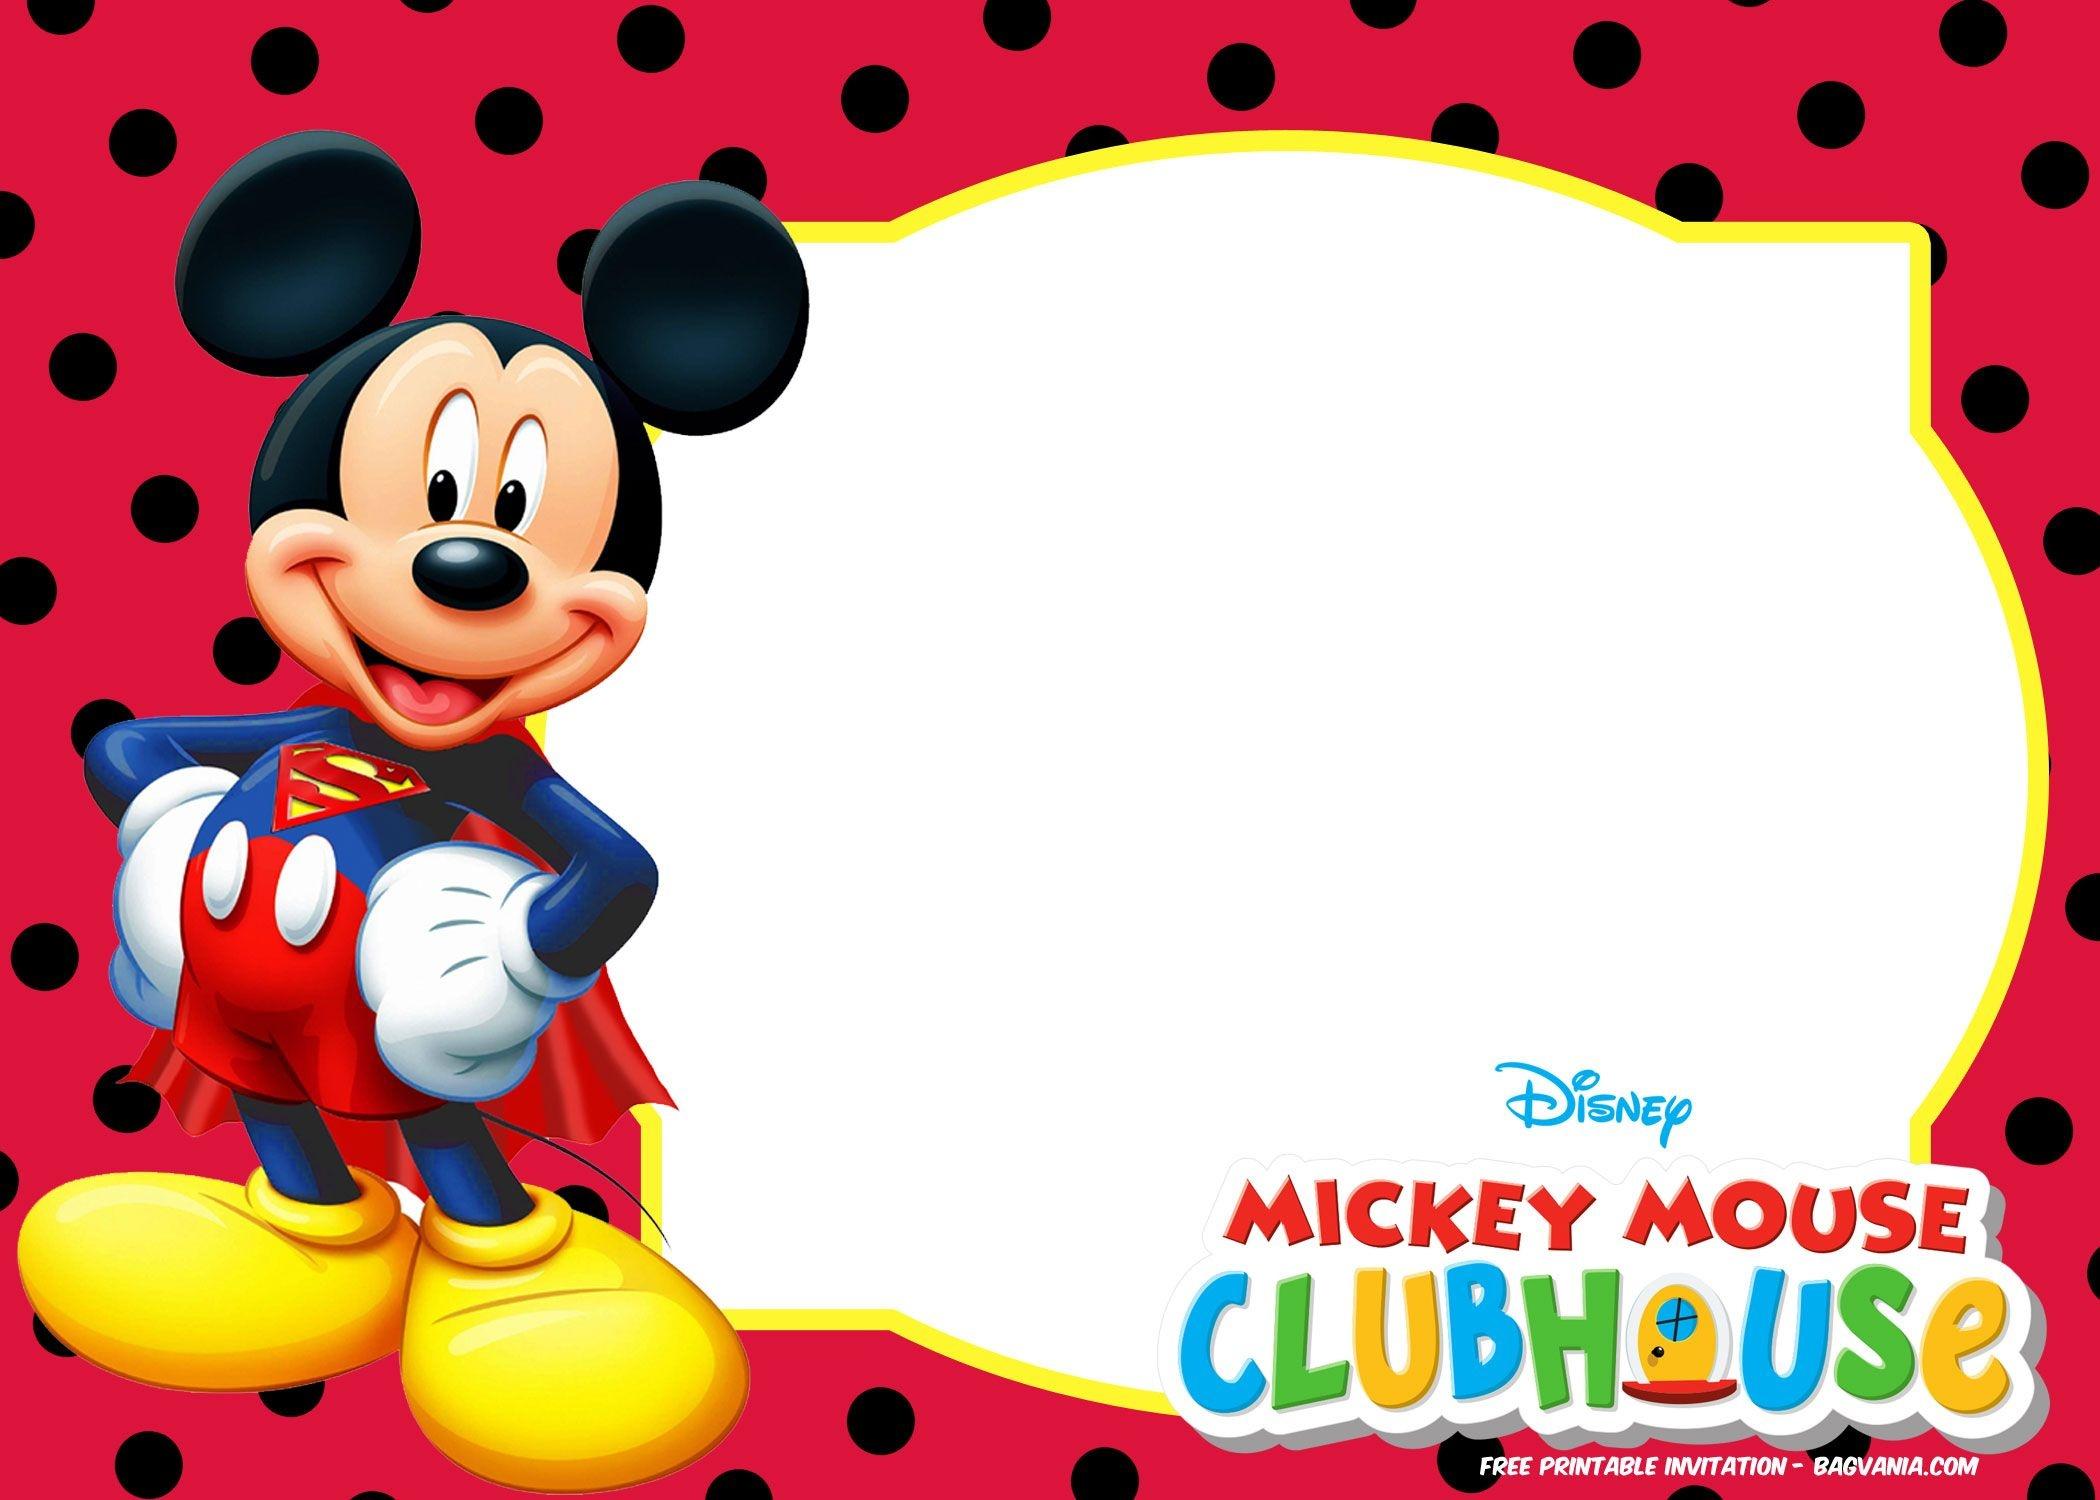 Mickey Mouse Invitations Template Free - Tutlin.psstech.co - Free Mickey Mouse Printable Templates